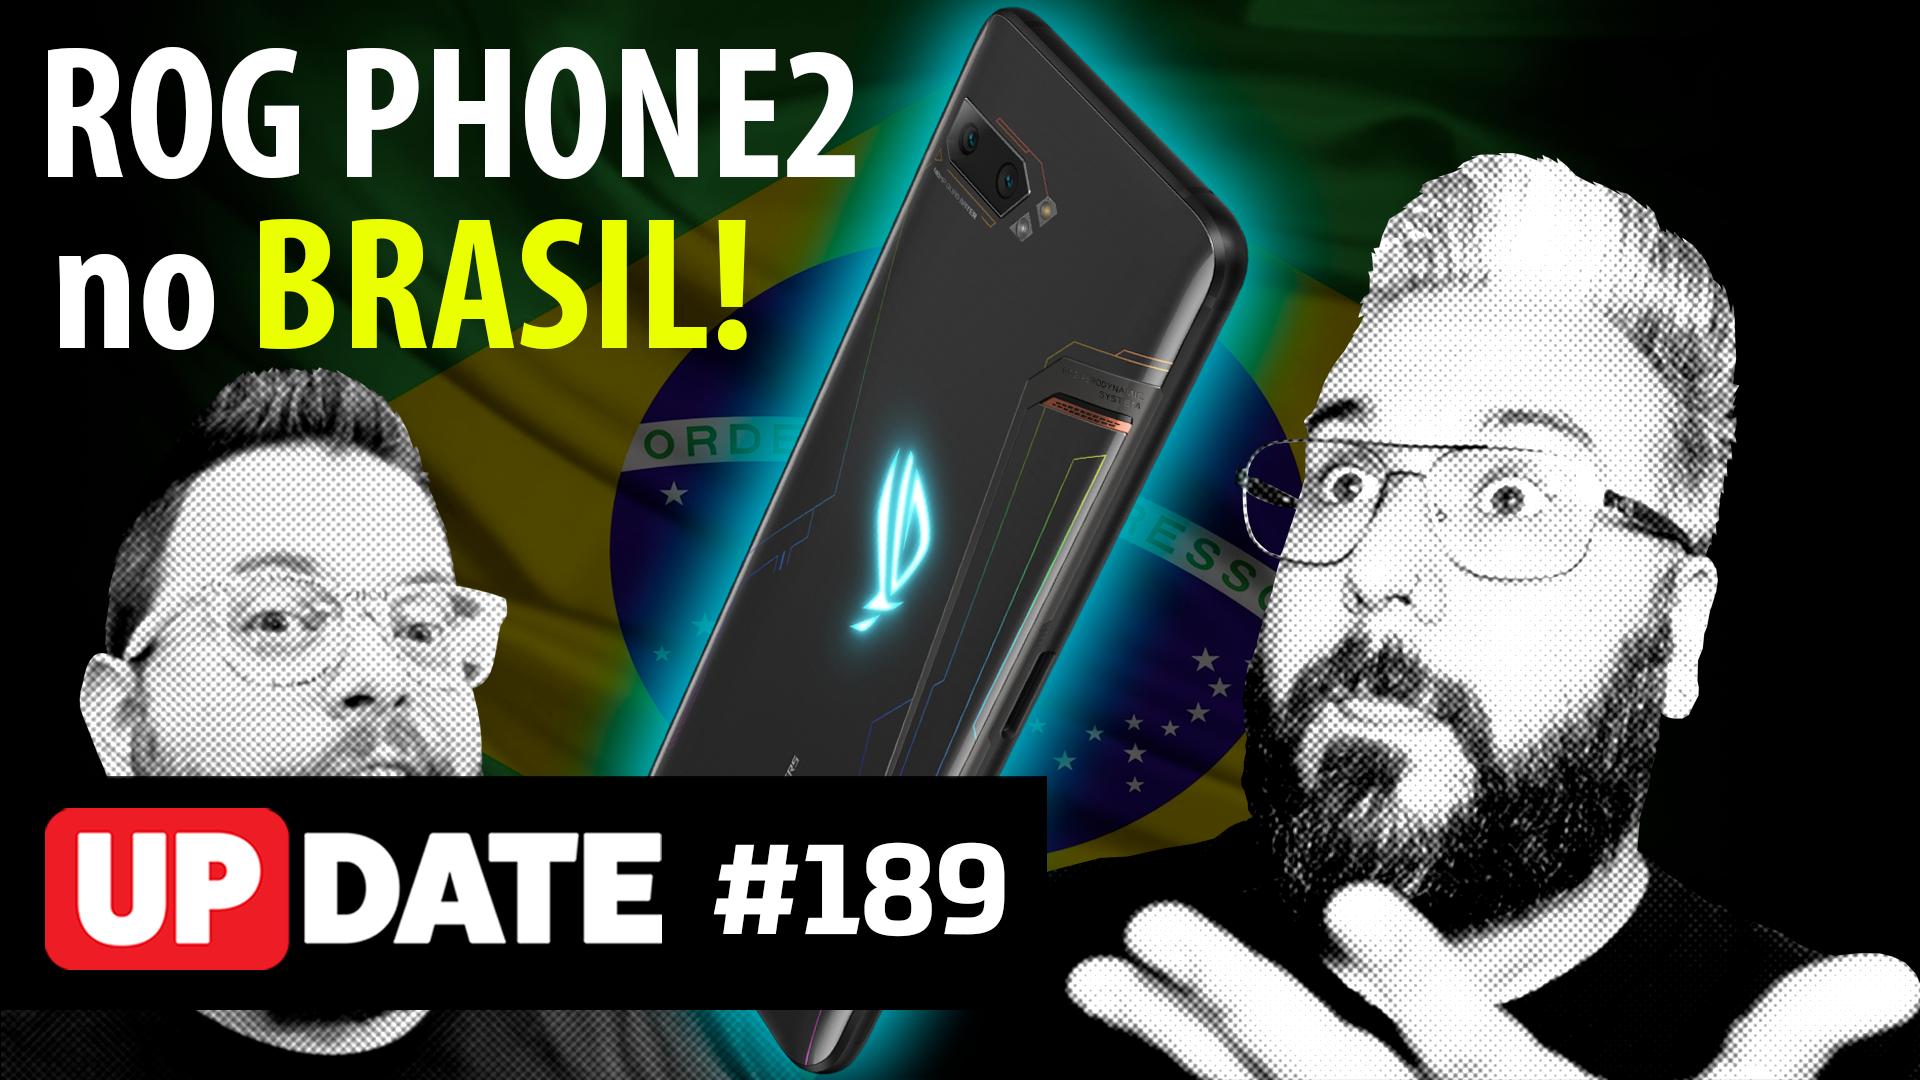 Update 189 – ROG no Brasil